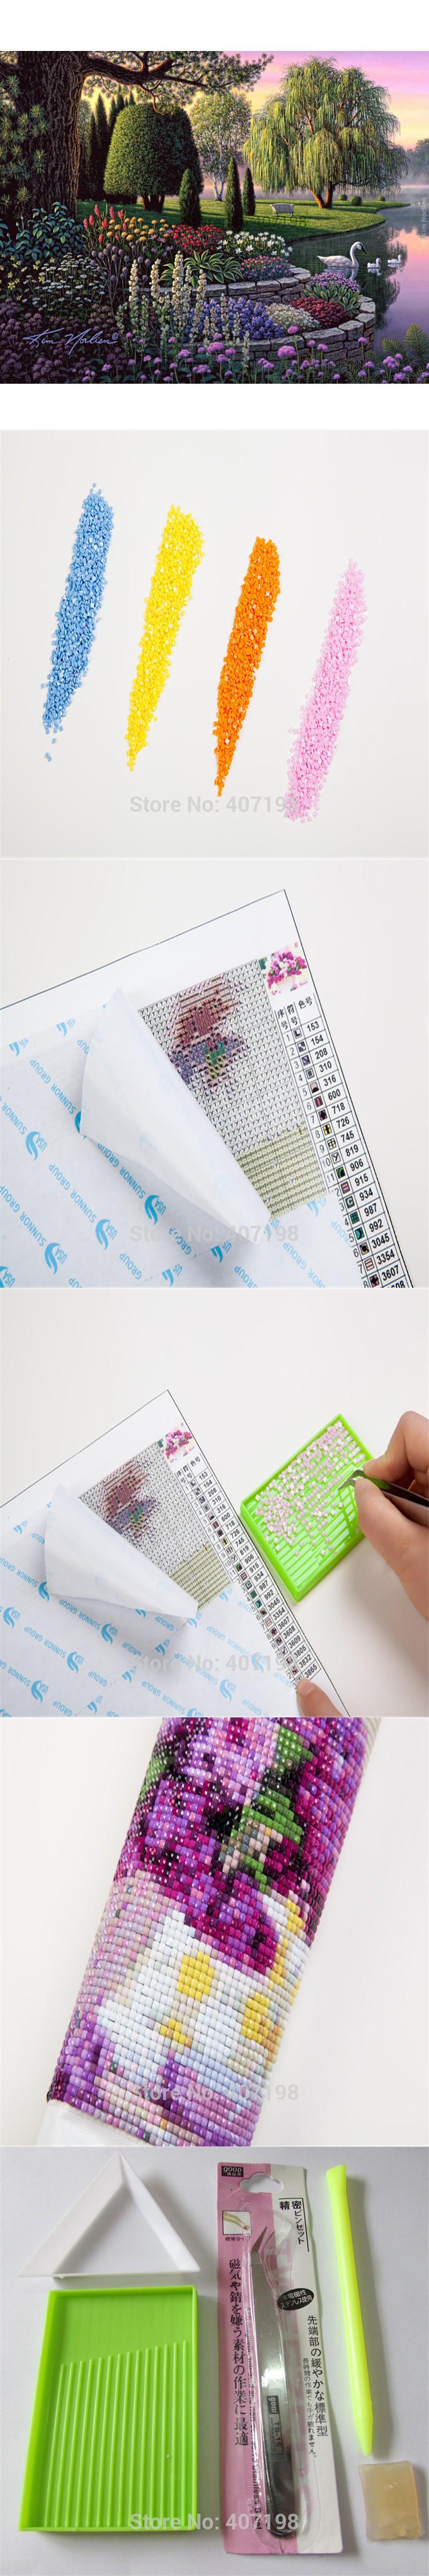 Diy 3D Diamond painting Mosaic Diamond Embroidery cross stitch pattern Full square Needlework Crafts Spring scenic Home decor $28